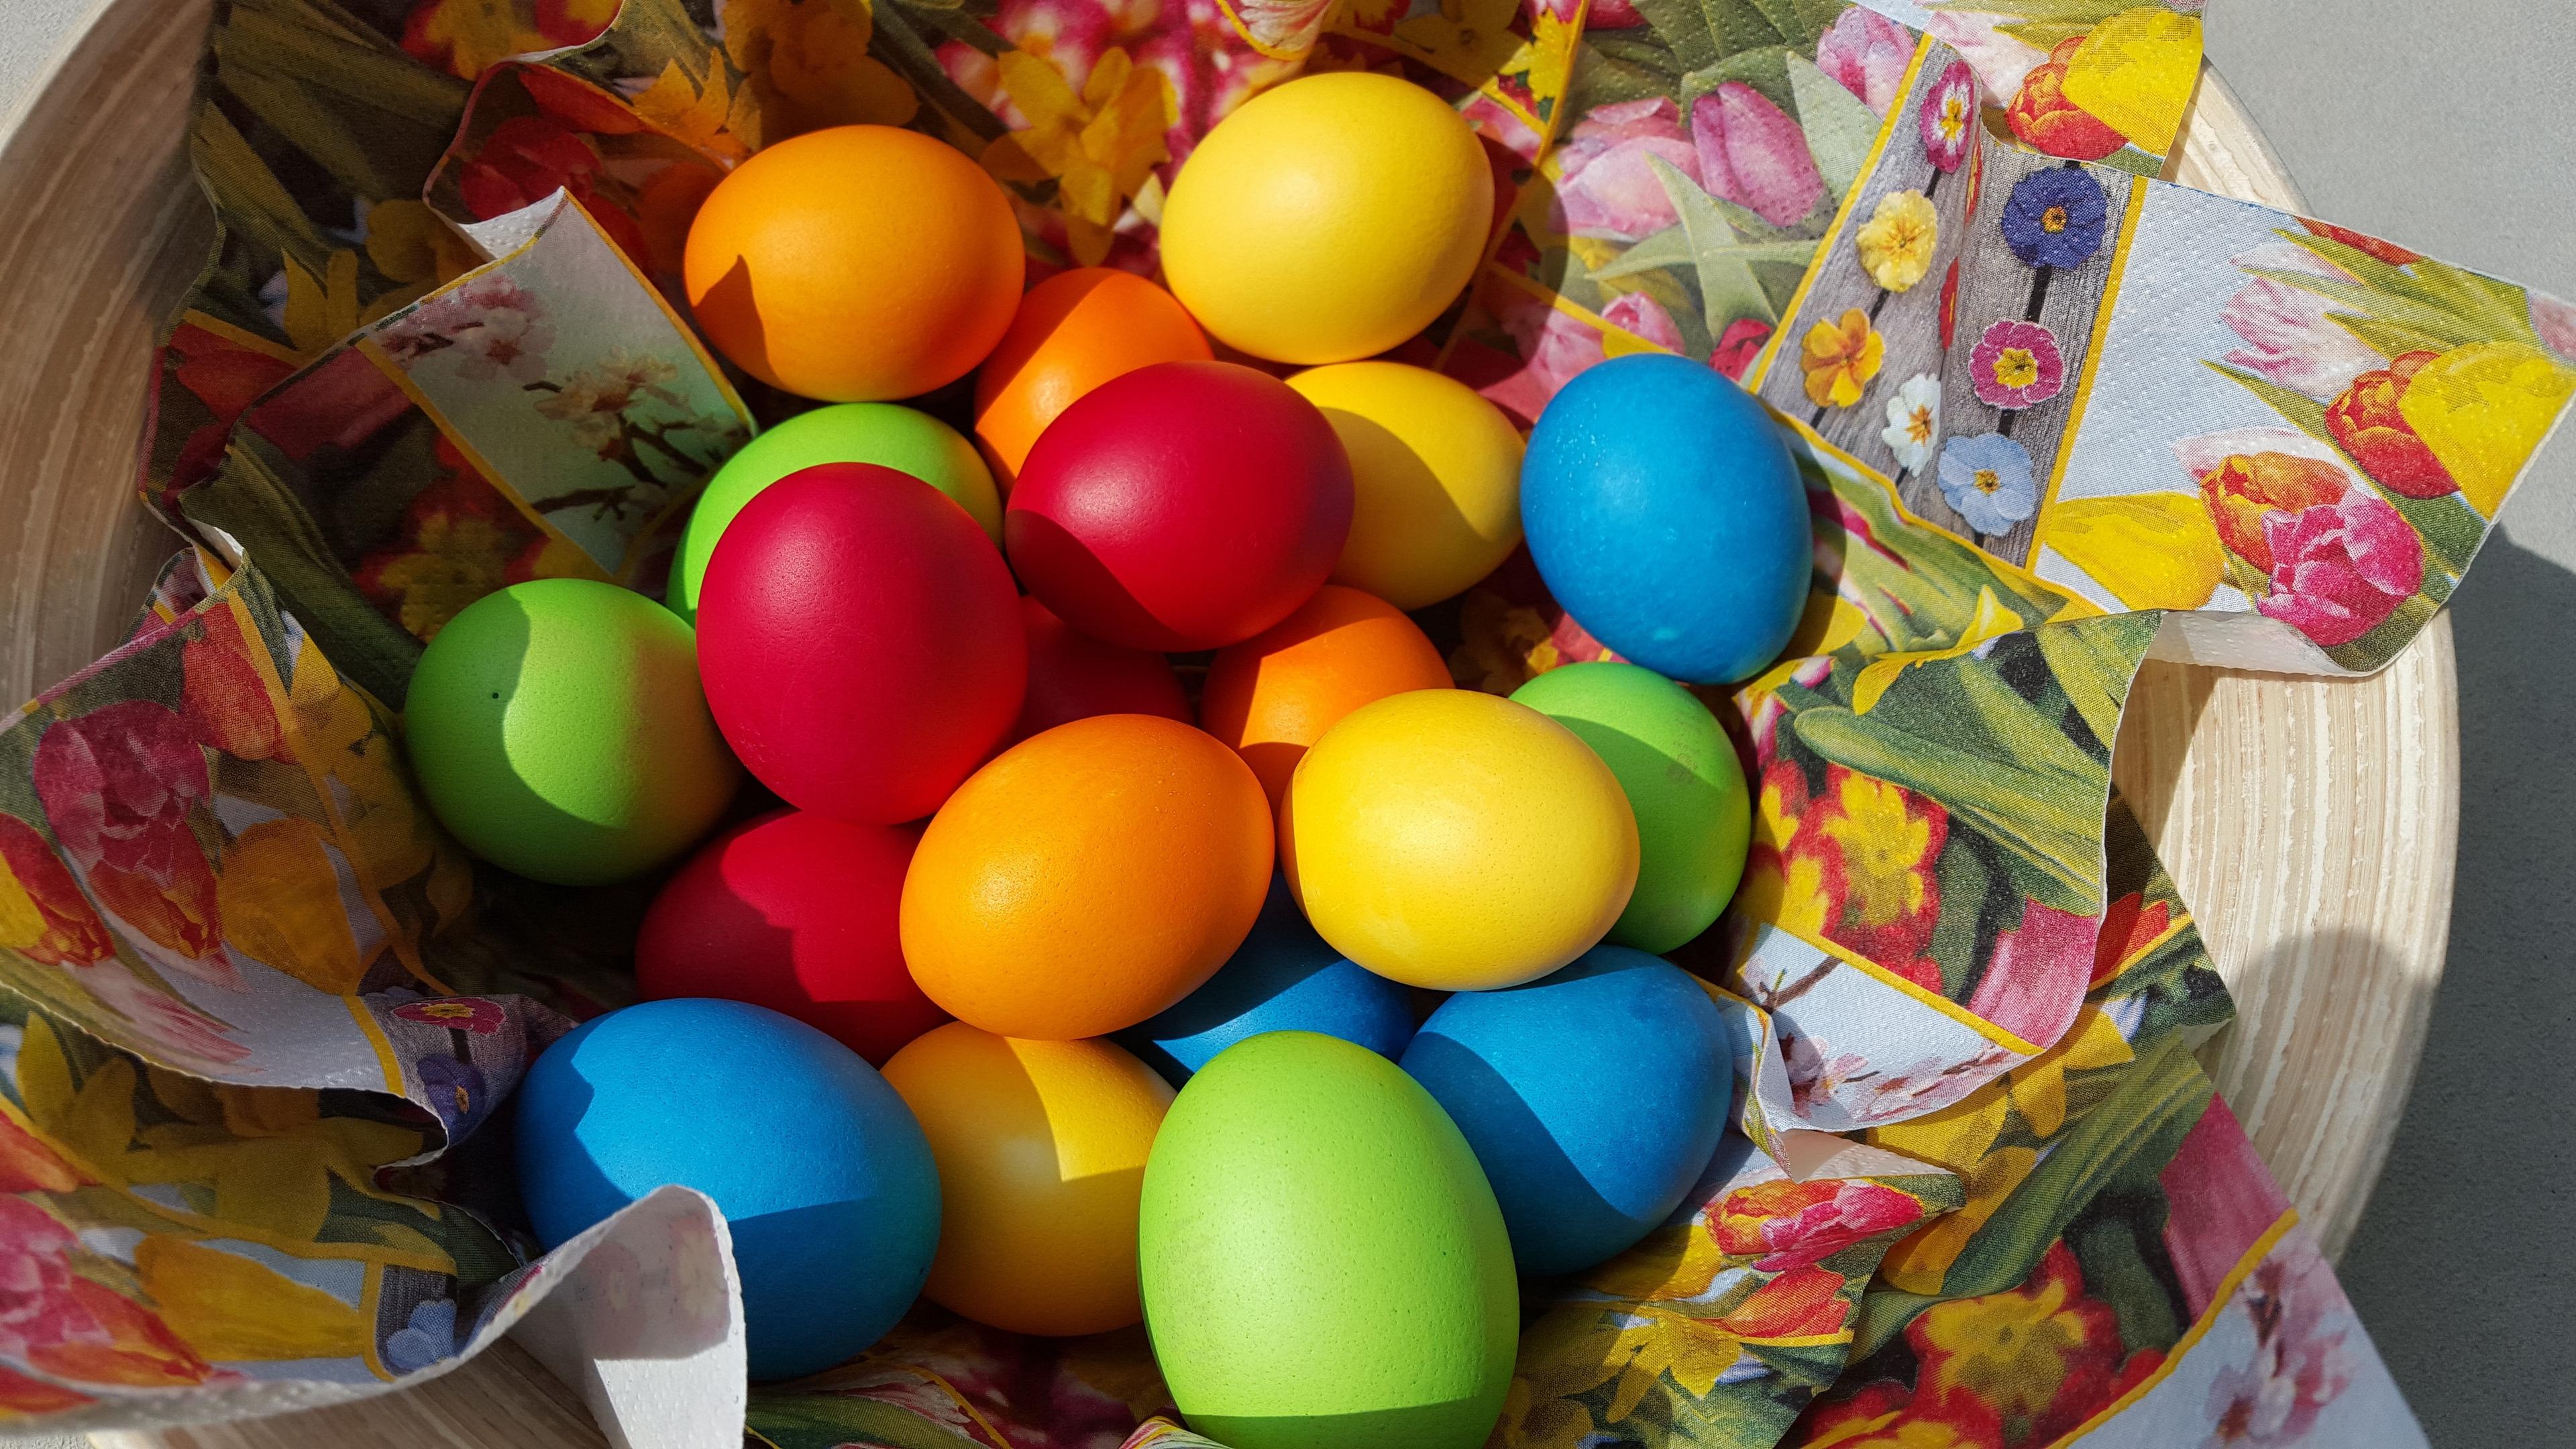 easter eggs easter plate 4k 1538344739 - easter eggs, easter, plate 4k - plate, easter eggs, Easter